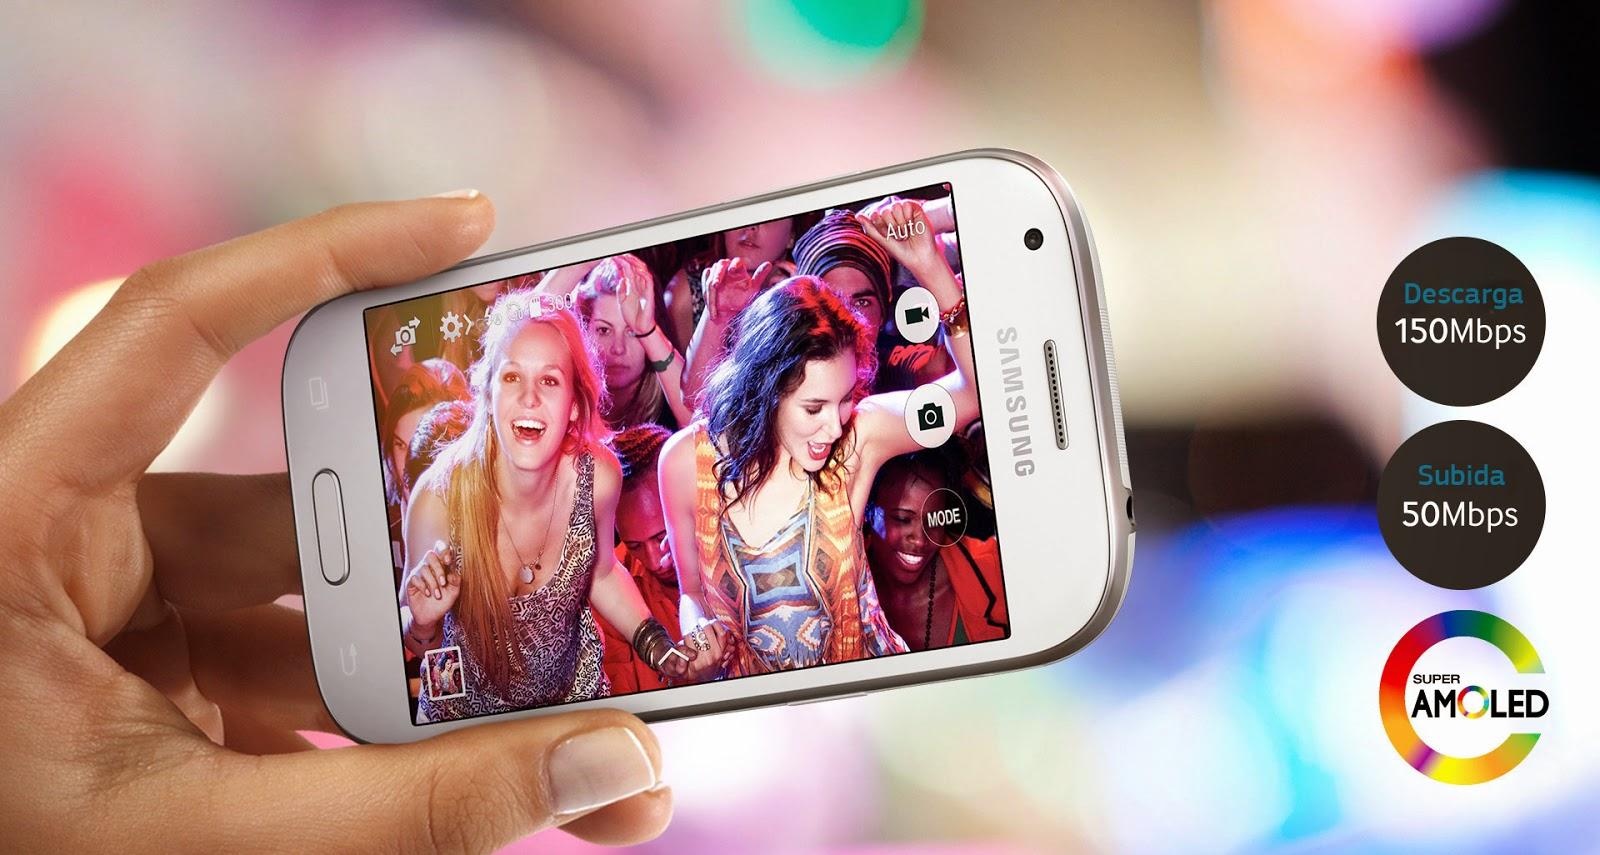 Características técnicas Samsung Galaxy Ace 4 3G